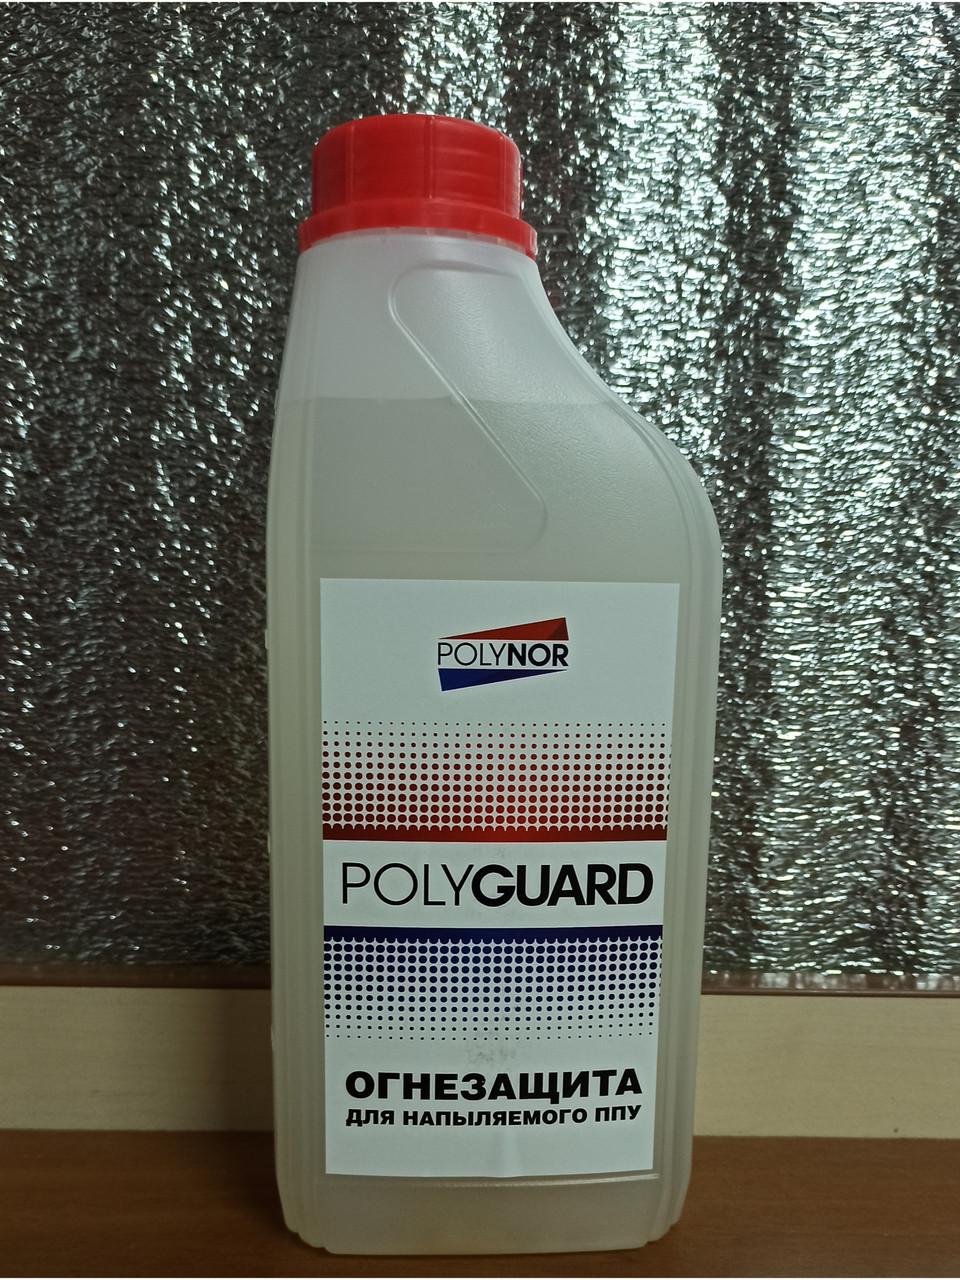 Огнезащита Polynor Polyguard для НПУ  1000 мл